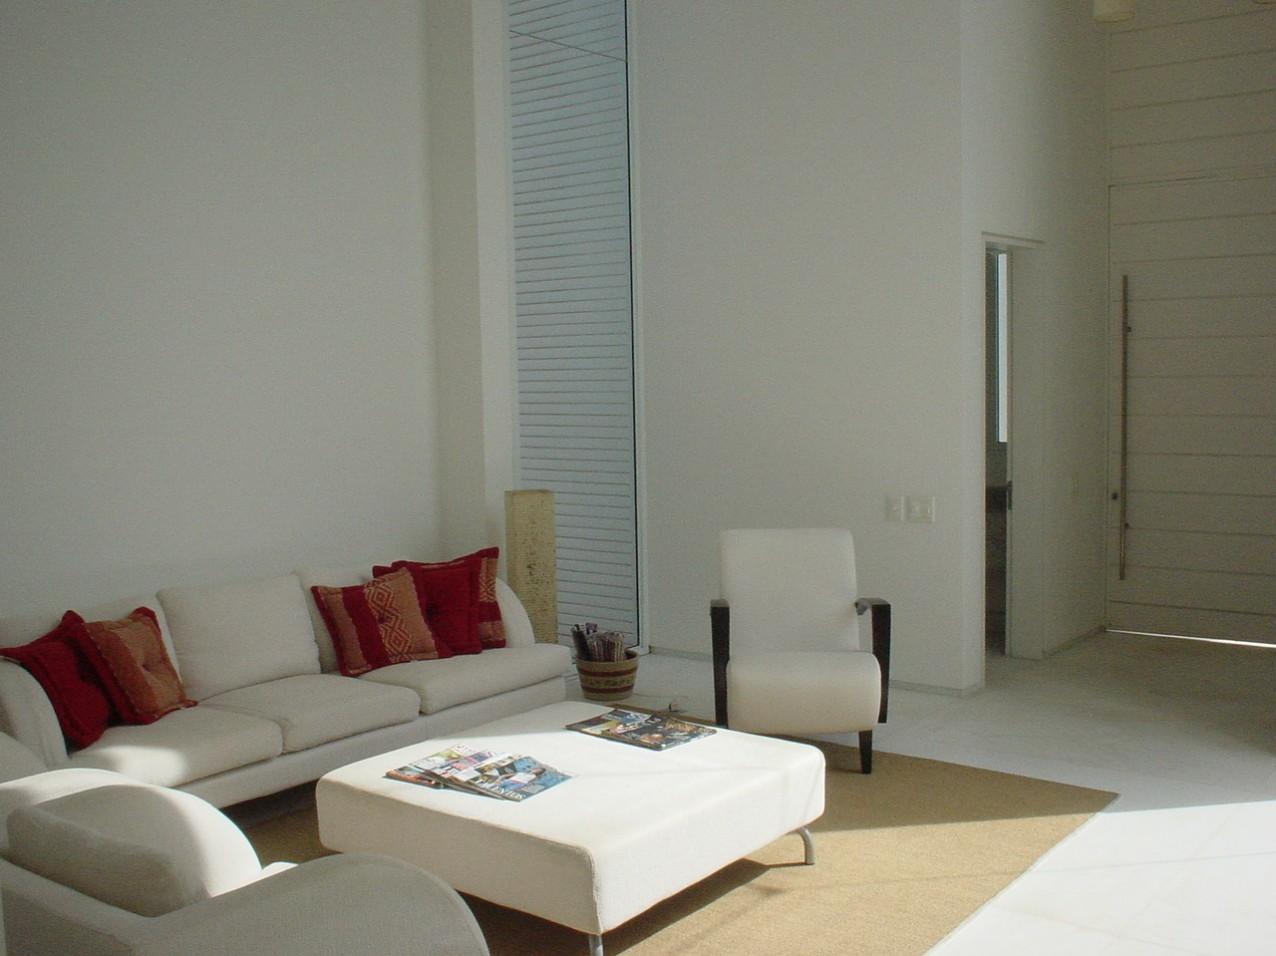 Obra residencial Riviera Sao Lourenco - Sala de estar